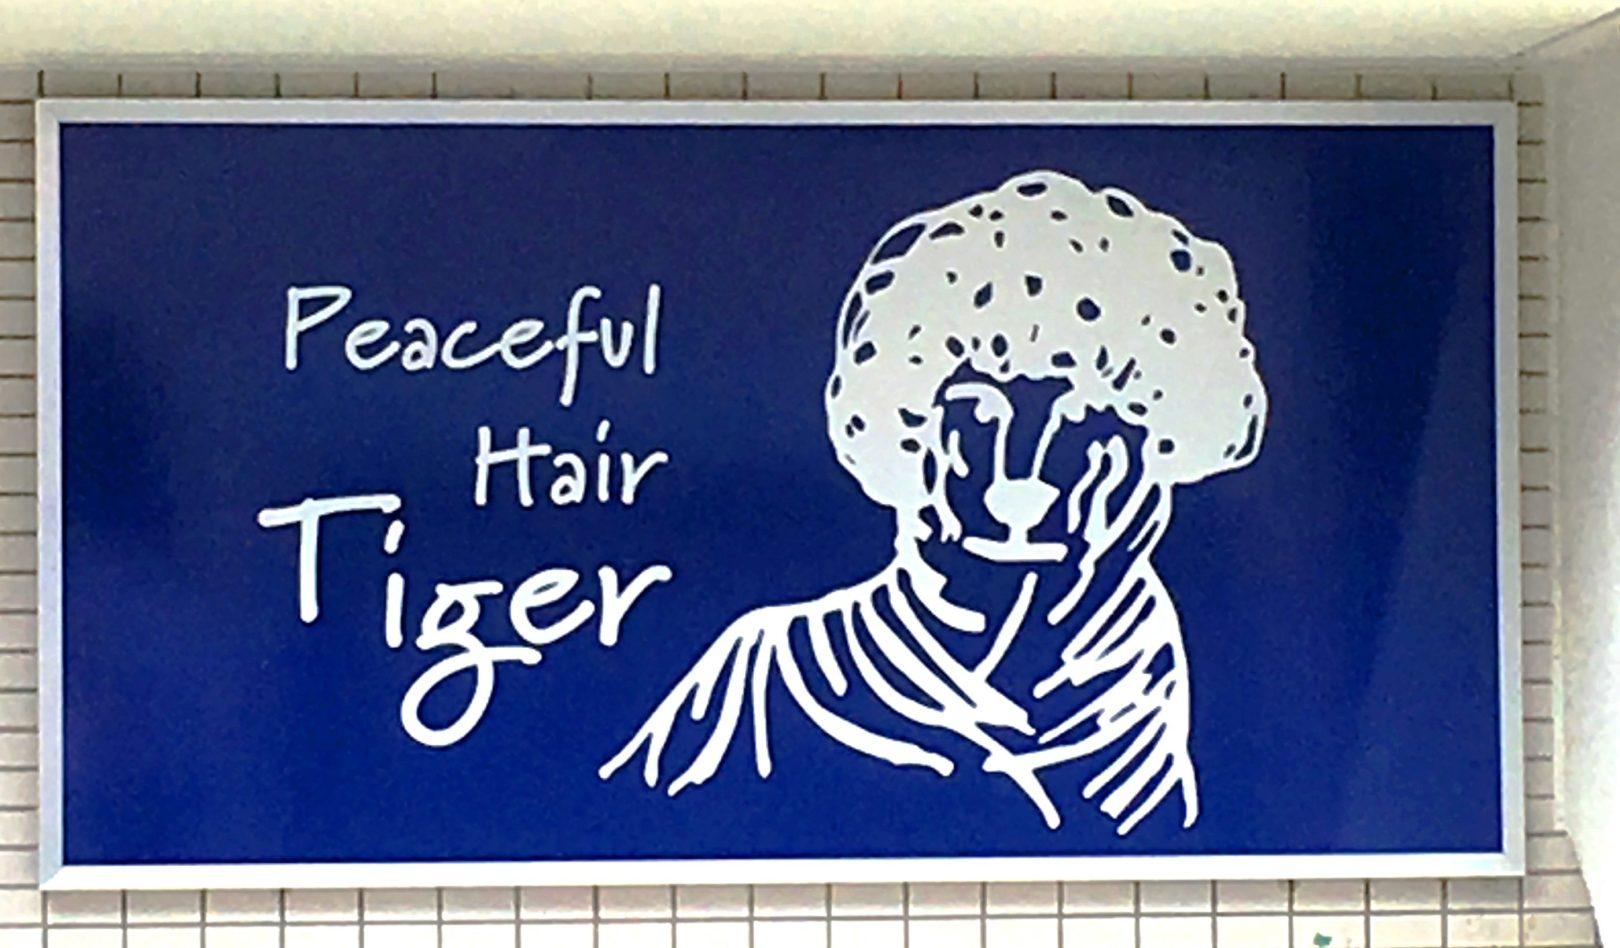 Peaceful Hair Tiger(おだやかな髪のトラ)